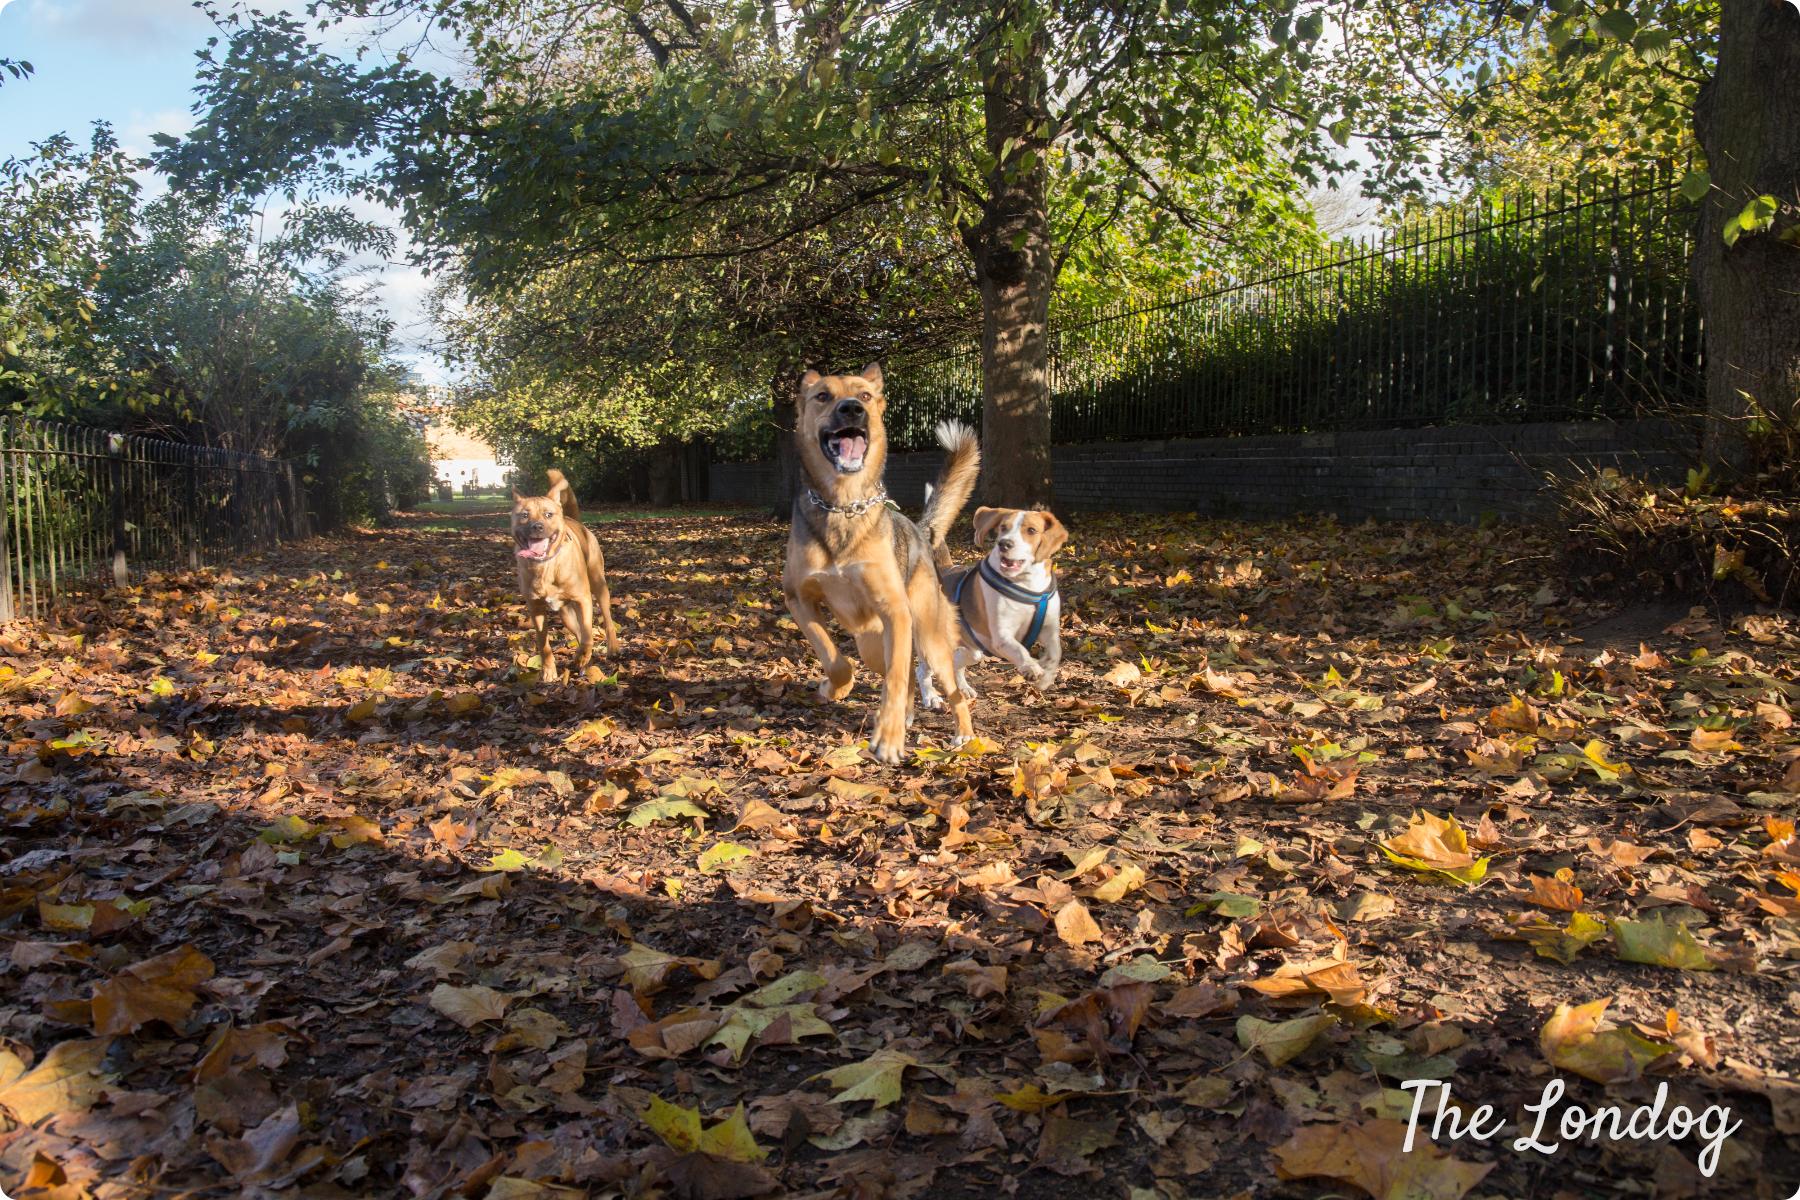 Enclosed Dog Parks The Londog